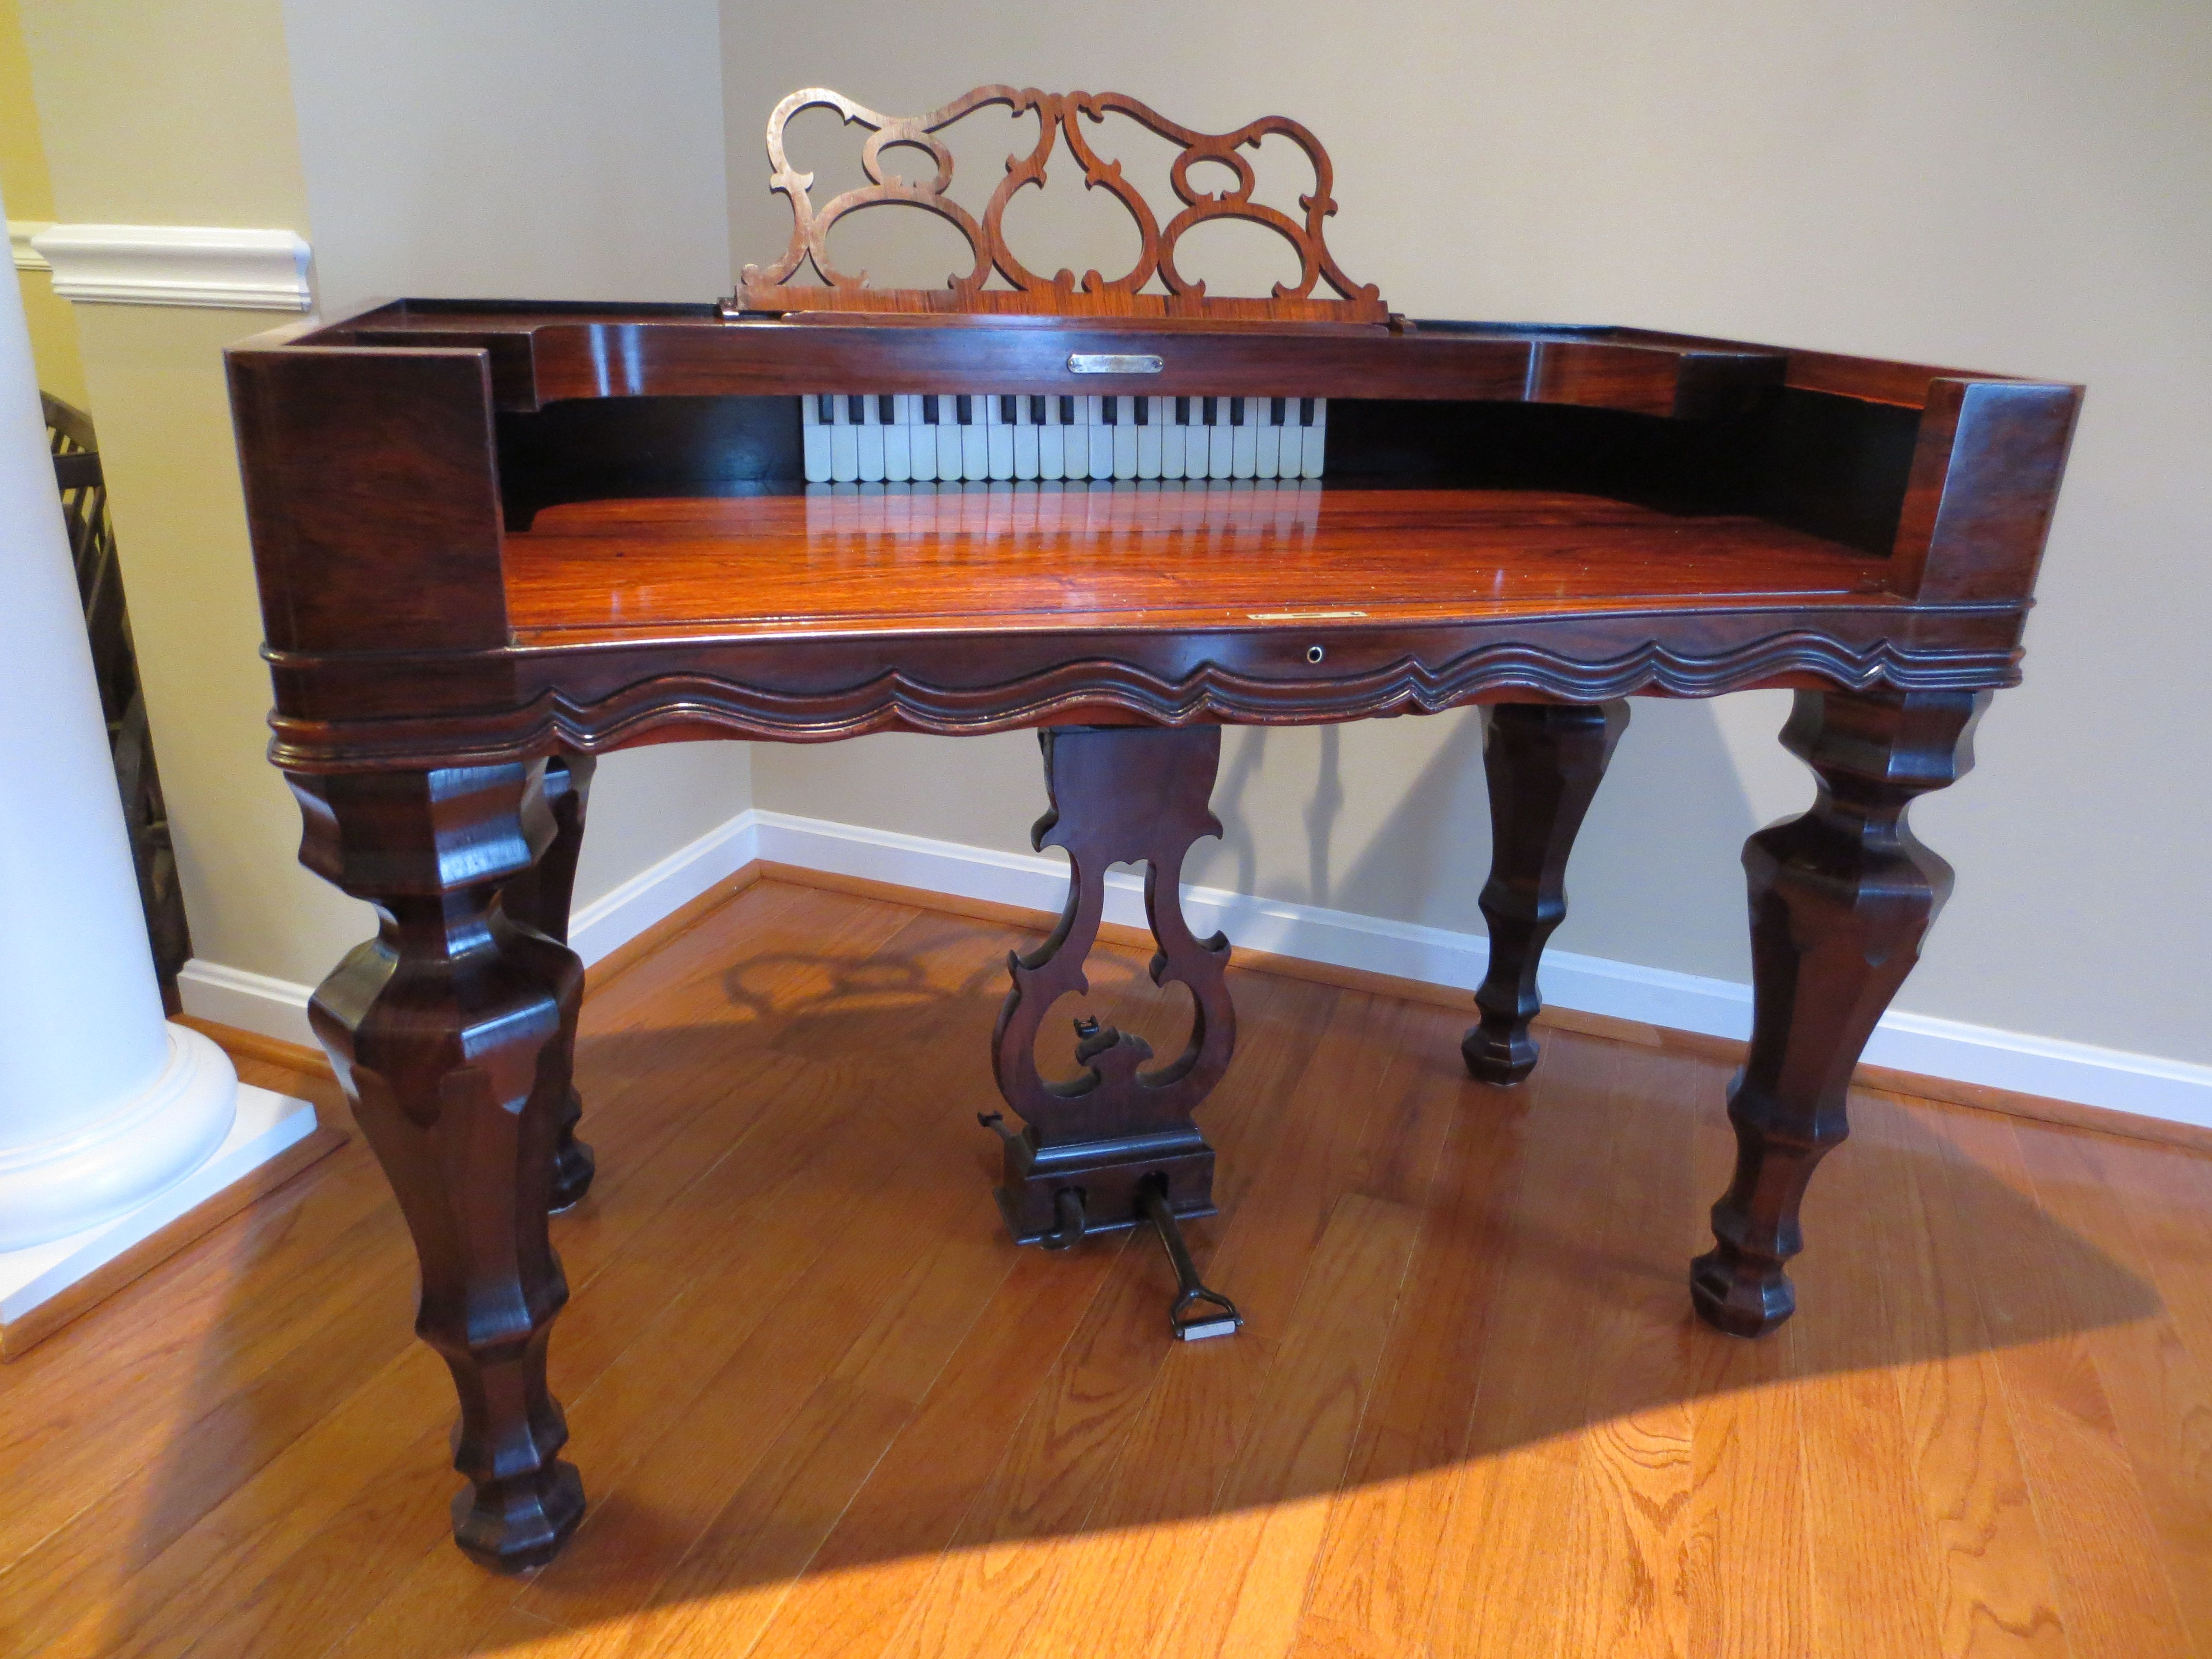 c 1860 treat linsley melodeon rosewood organ desk writing desk